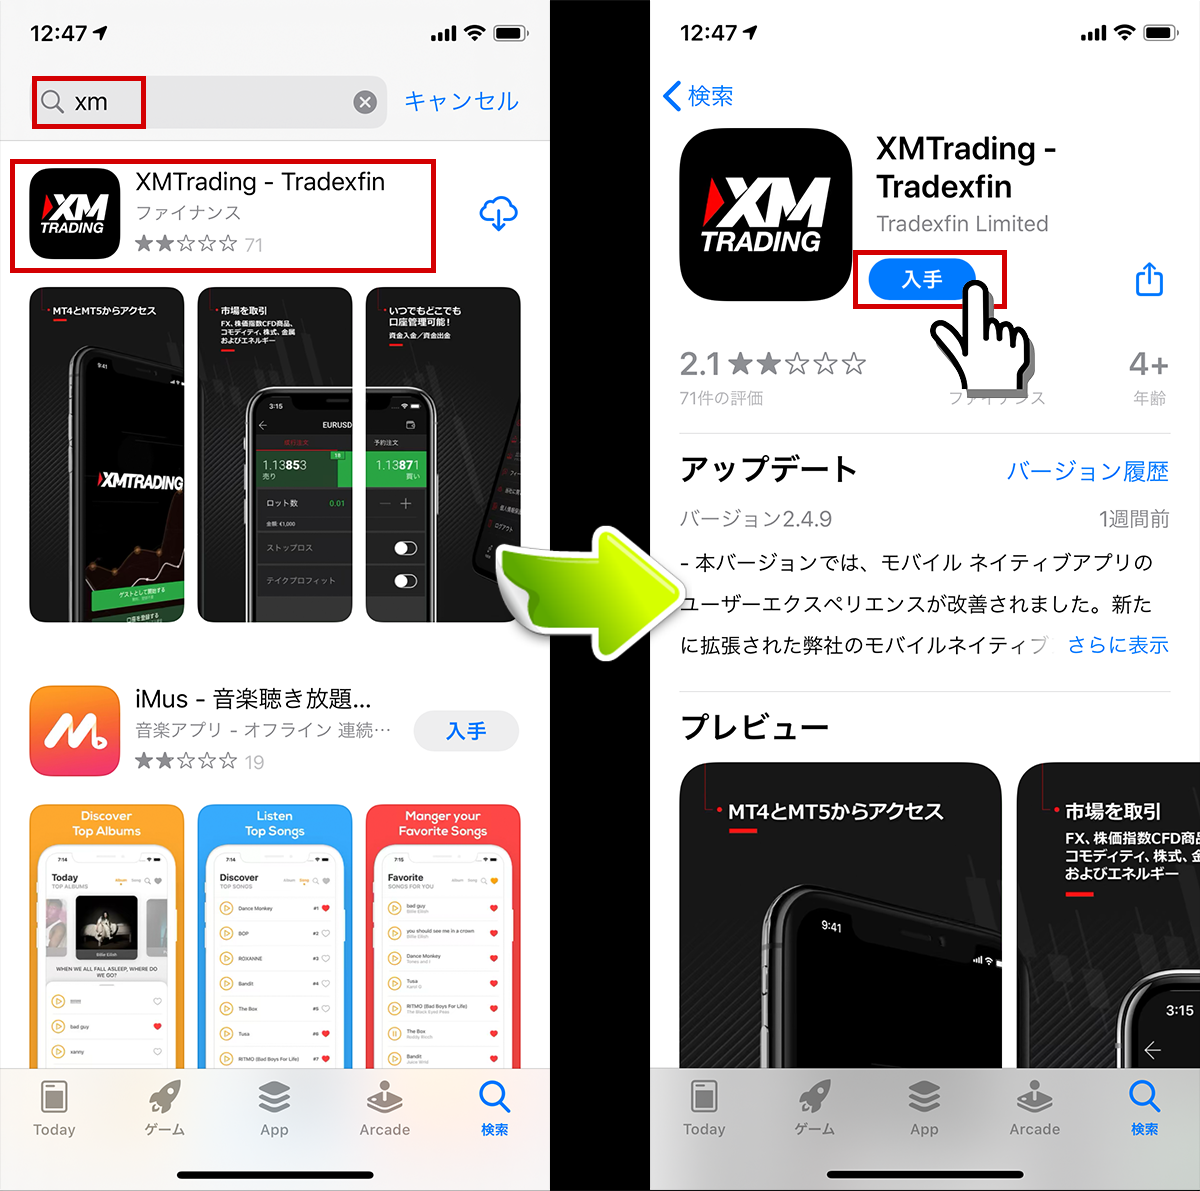 XMTradingアプリのインストール画面